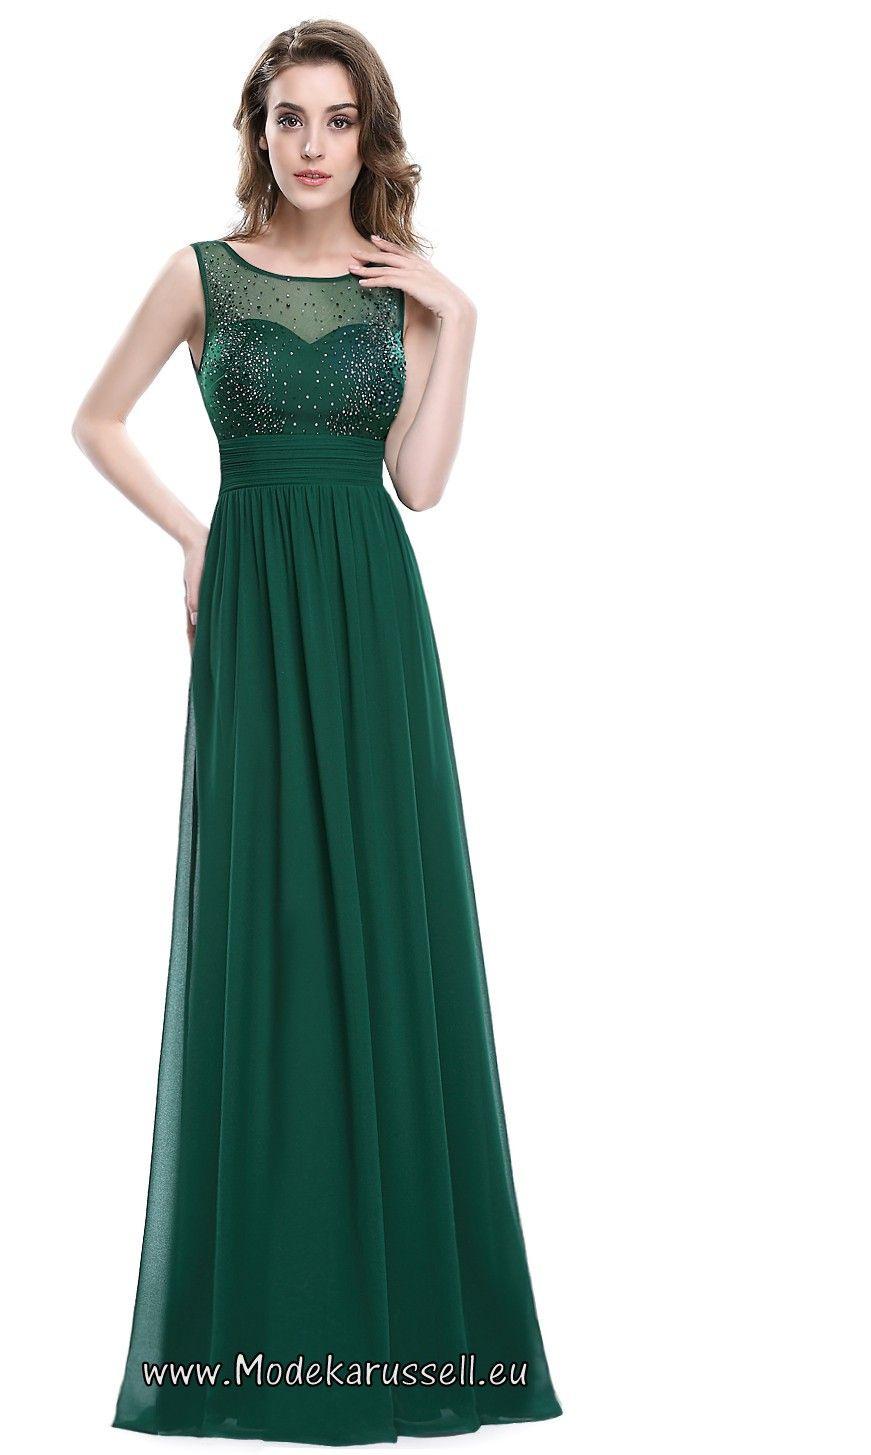 10 Einzigartig Abendkleid Dunkelgrün Spezialgebiet17 Schön Abendkleid Dunkelgrün Spezialgebiet